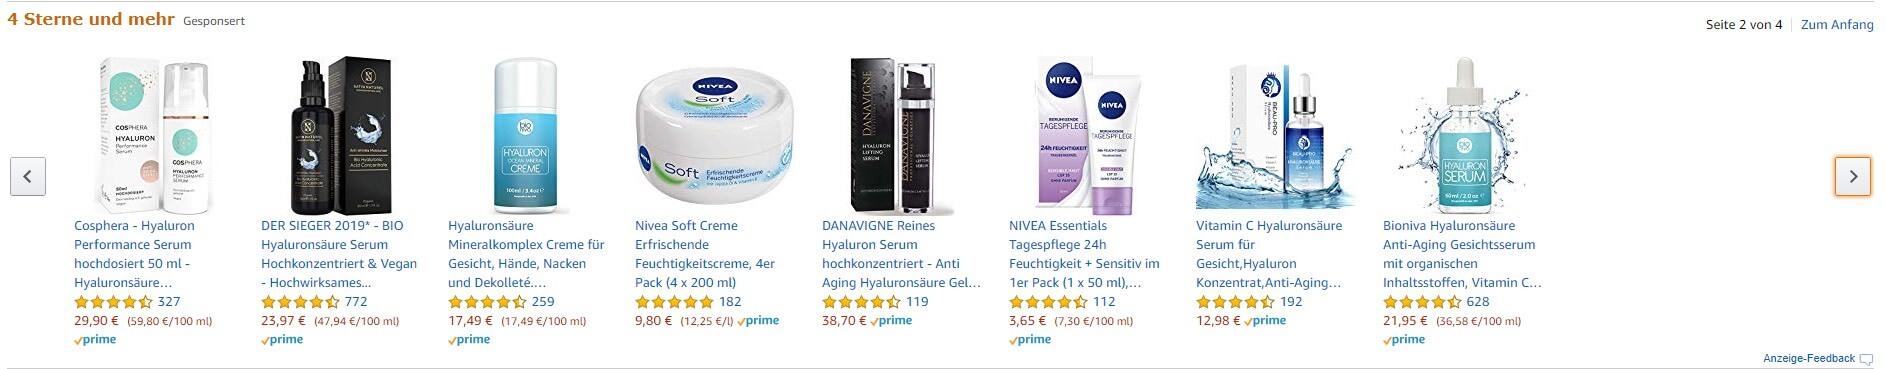 amazon news sponsored product product targeting